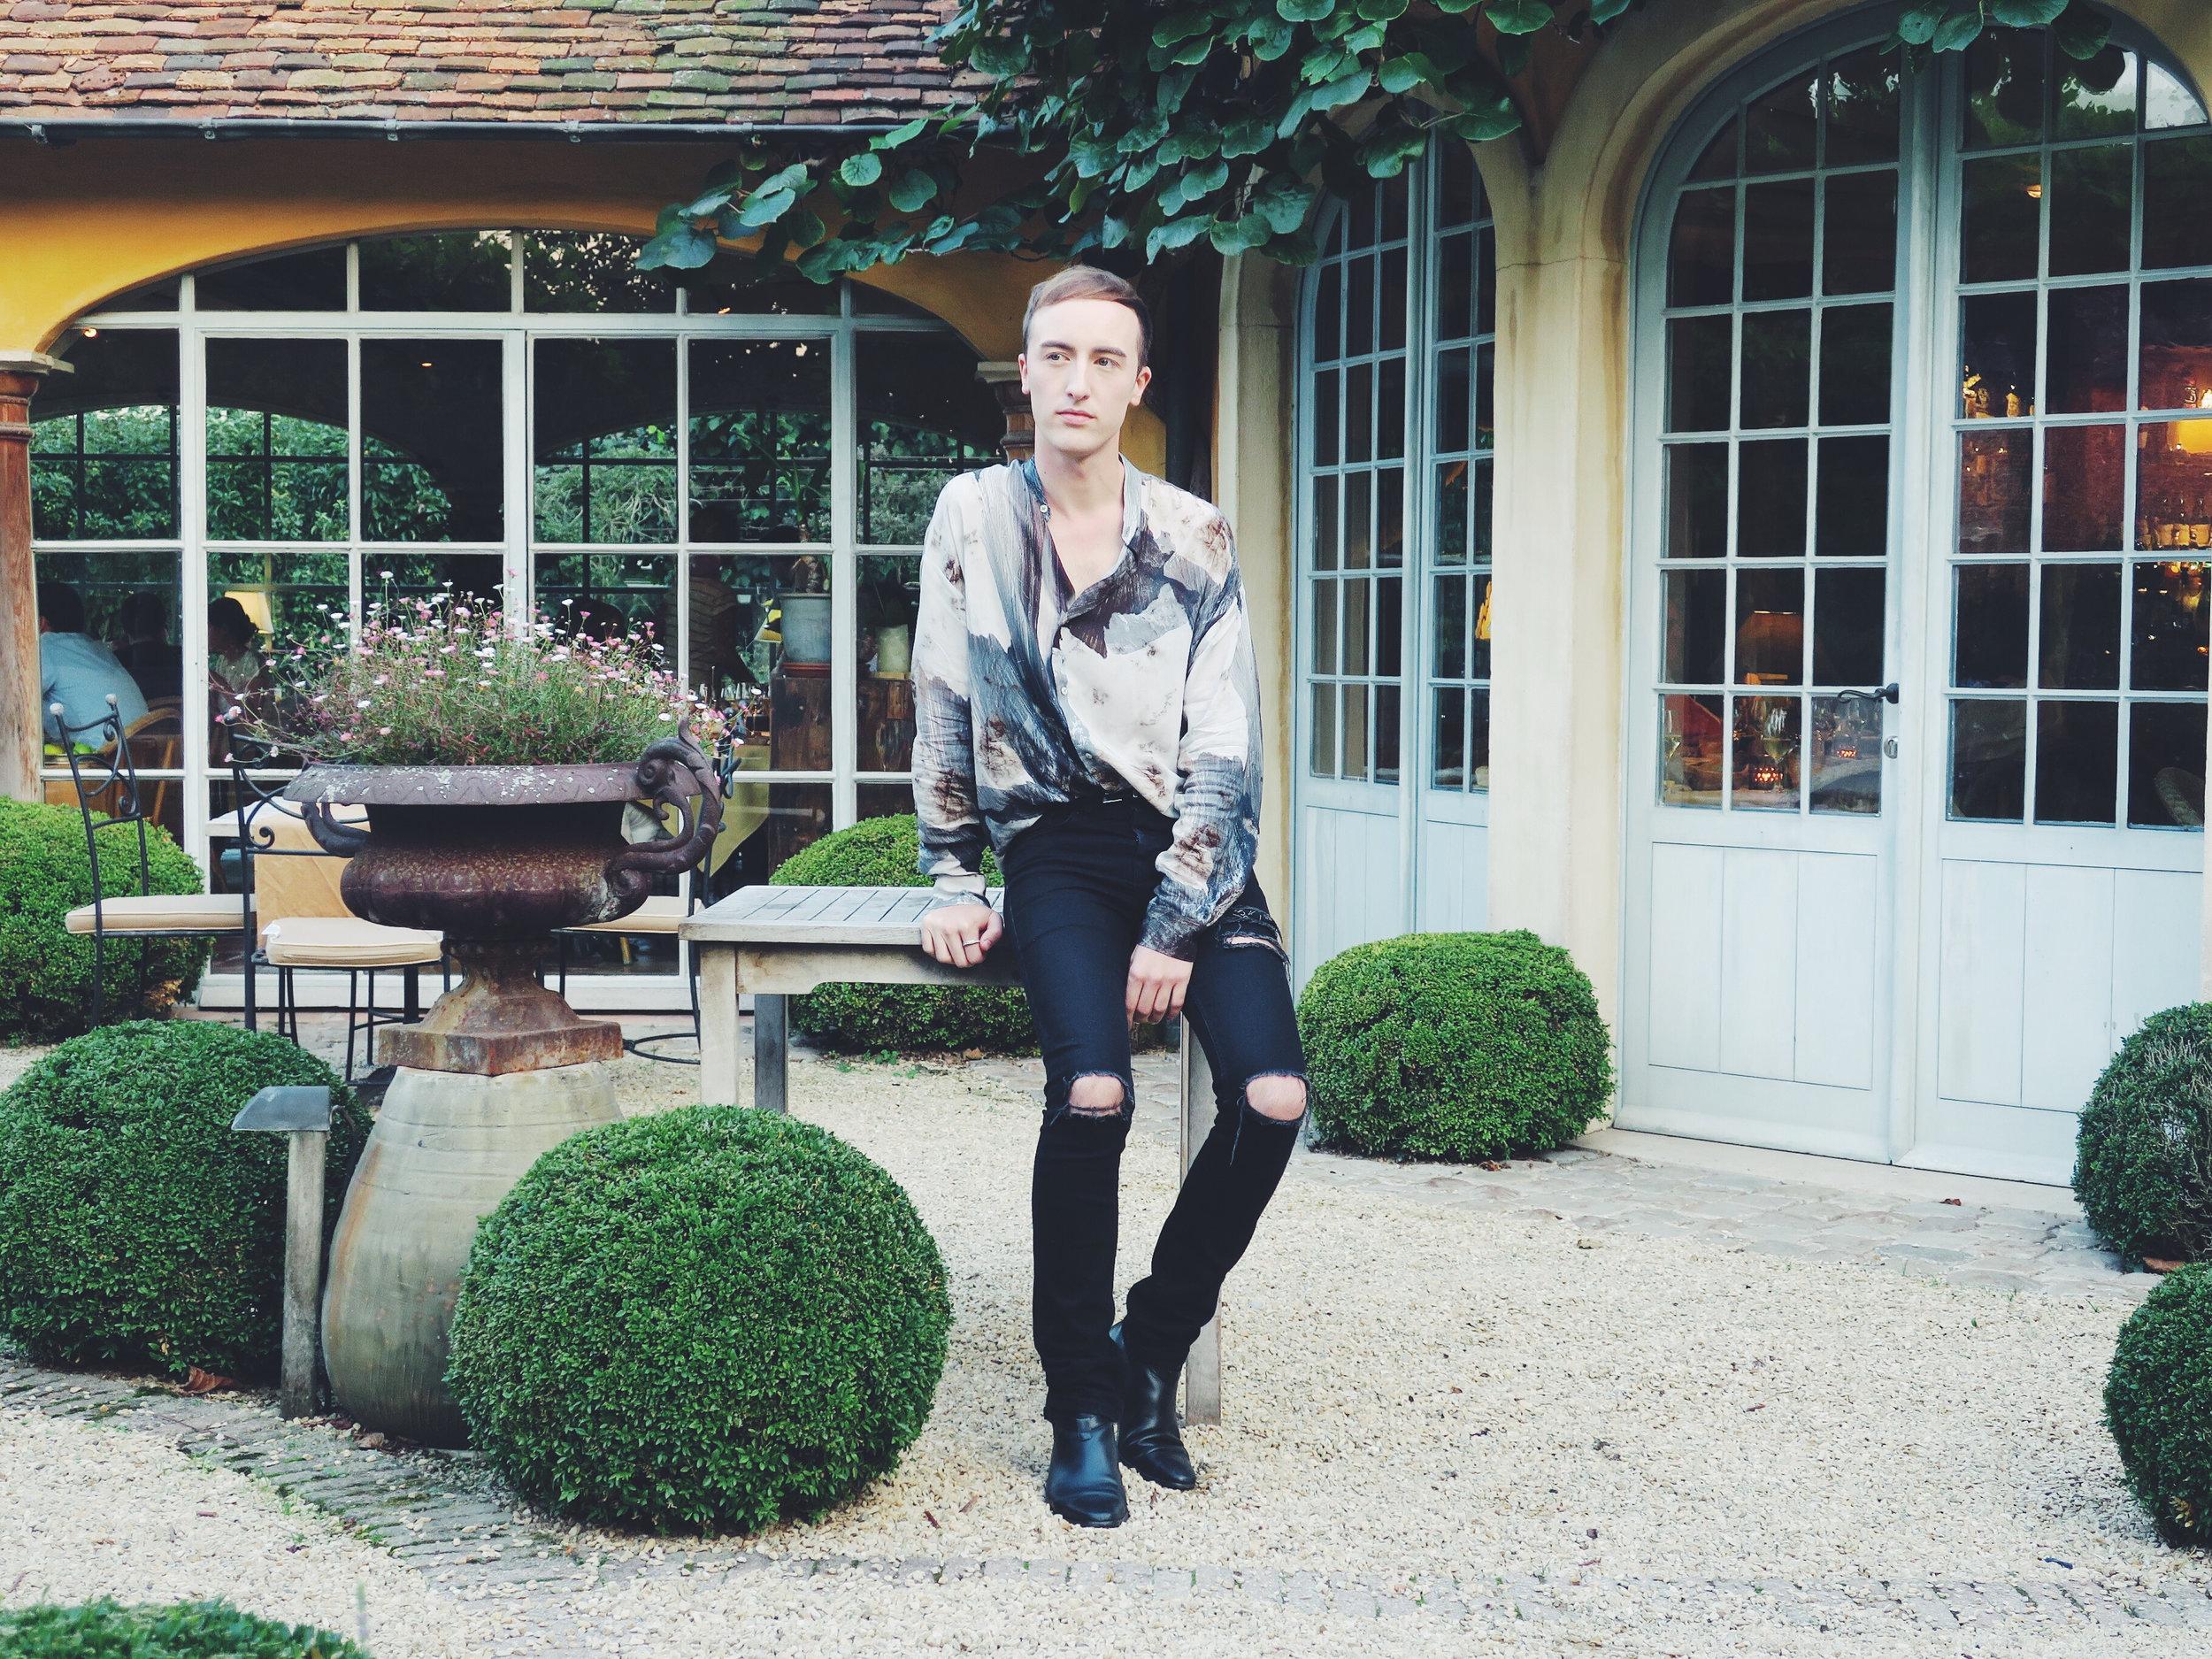 Zara shirt - Asos jeans - Sacha ankle boots